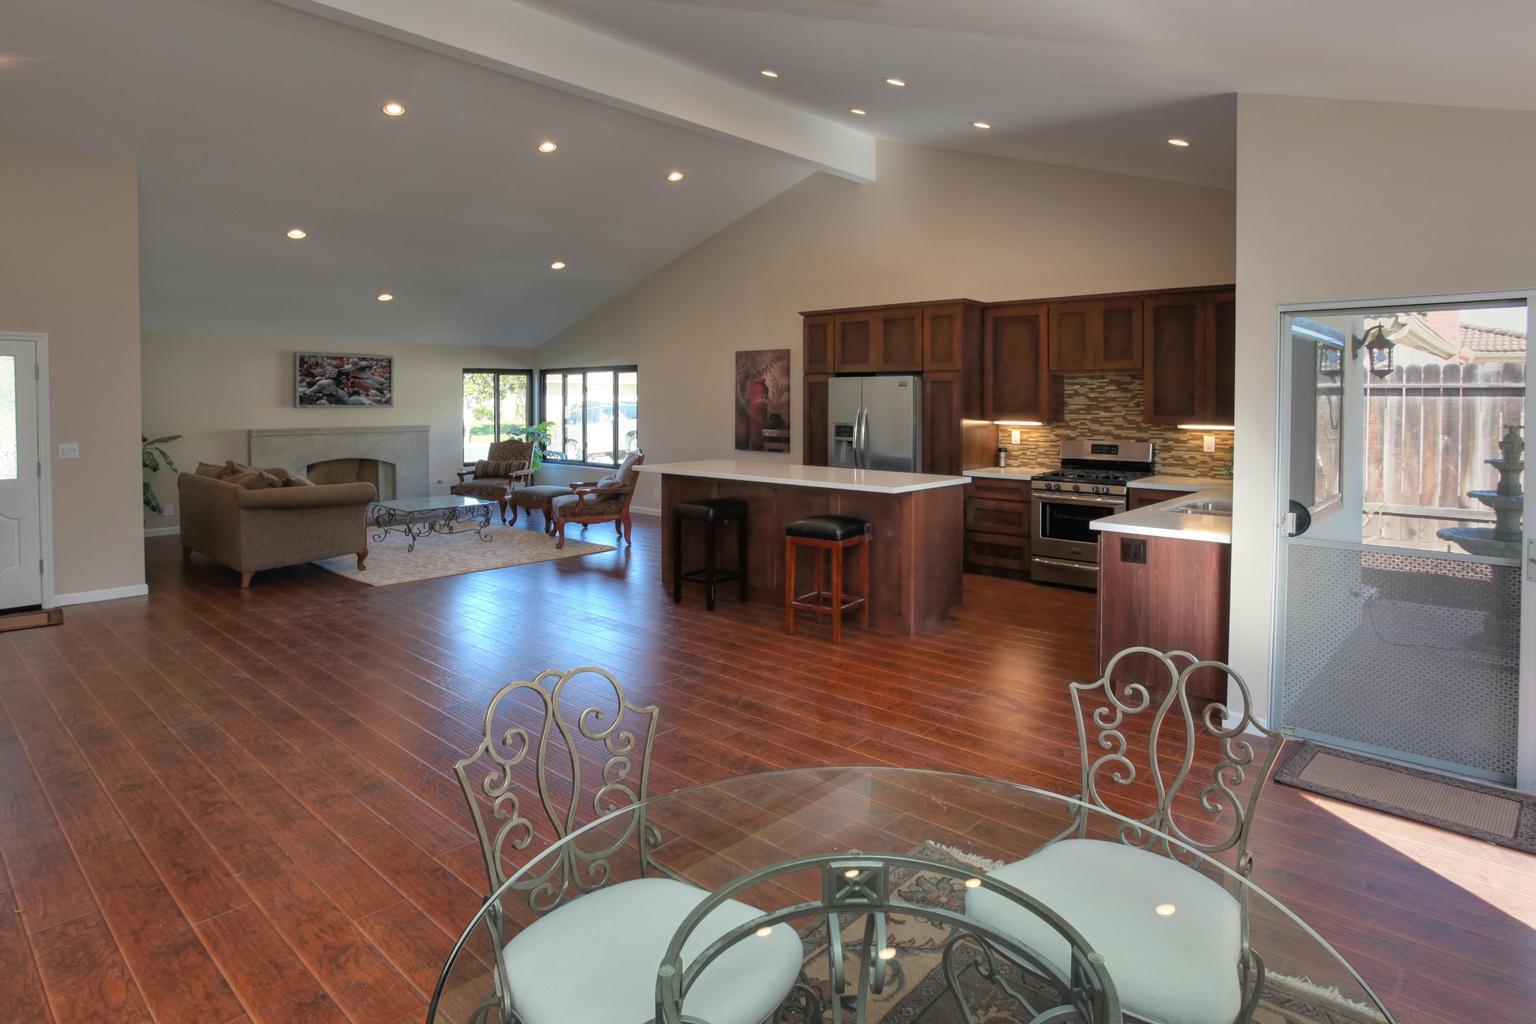 Property photo for 6167 Manzanillo Dr Goleta, California 93117 - 14-302